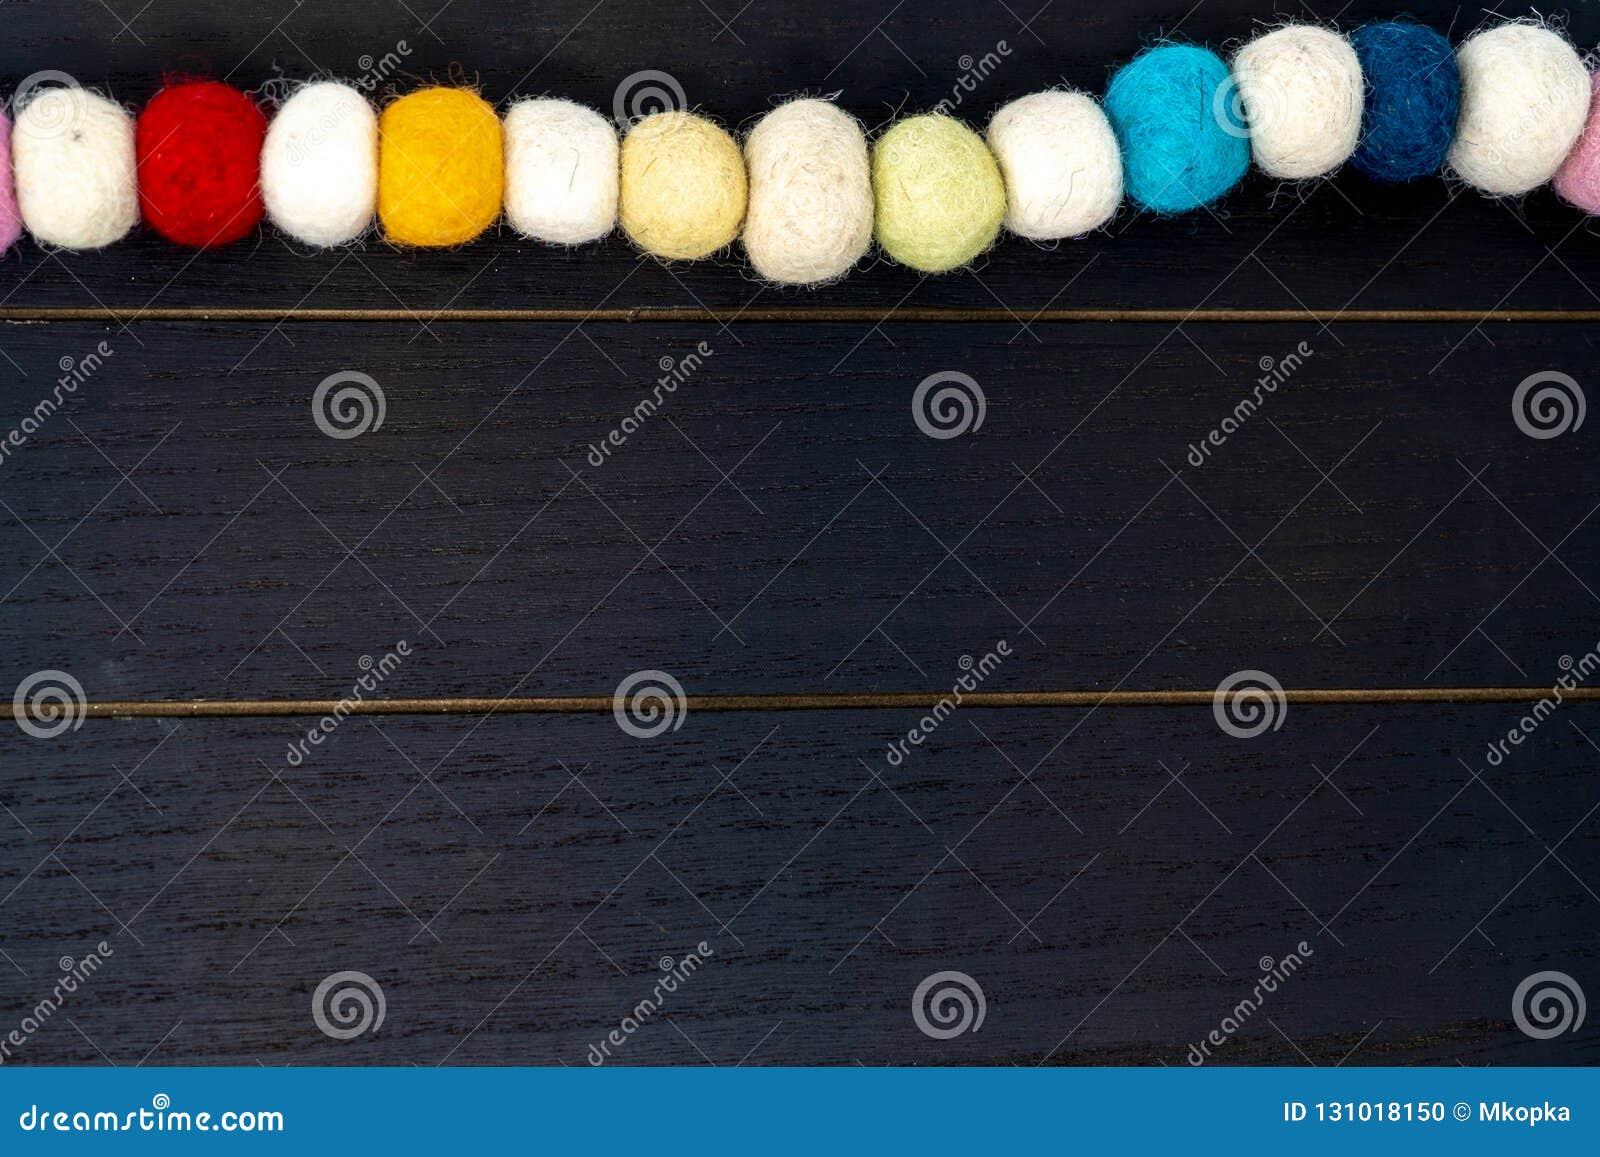 Pretty Colorful Rainbow Pom Pom Fabric Garland Over Black Wood Backdrop Stock Photo Image Of Festive Black 131018150